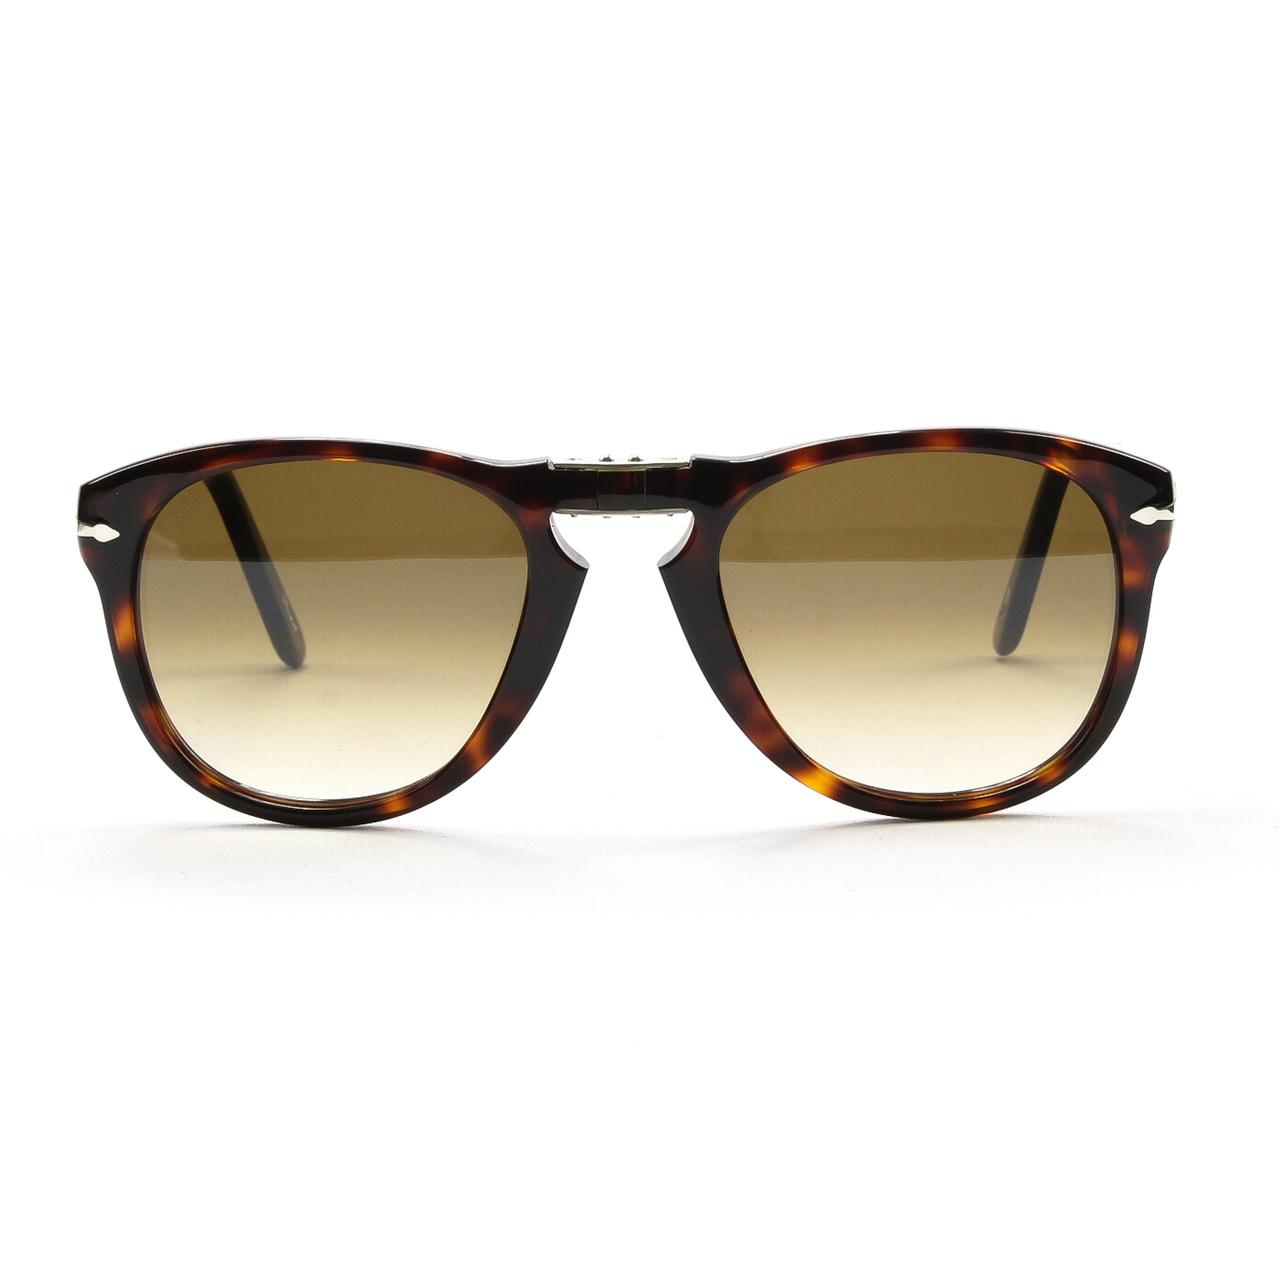 Persol 714 Folding Sunglasses 24/51 Brown Havana, Gradient Lenses PO0714 54mm | eBay